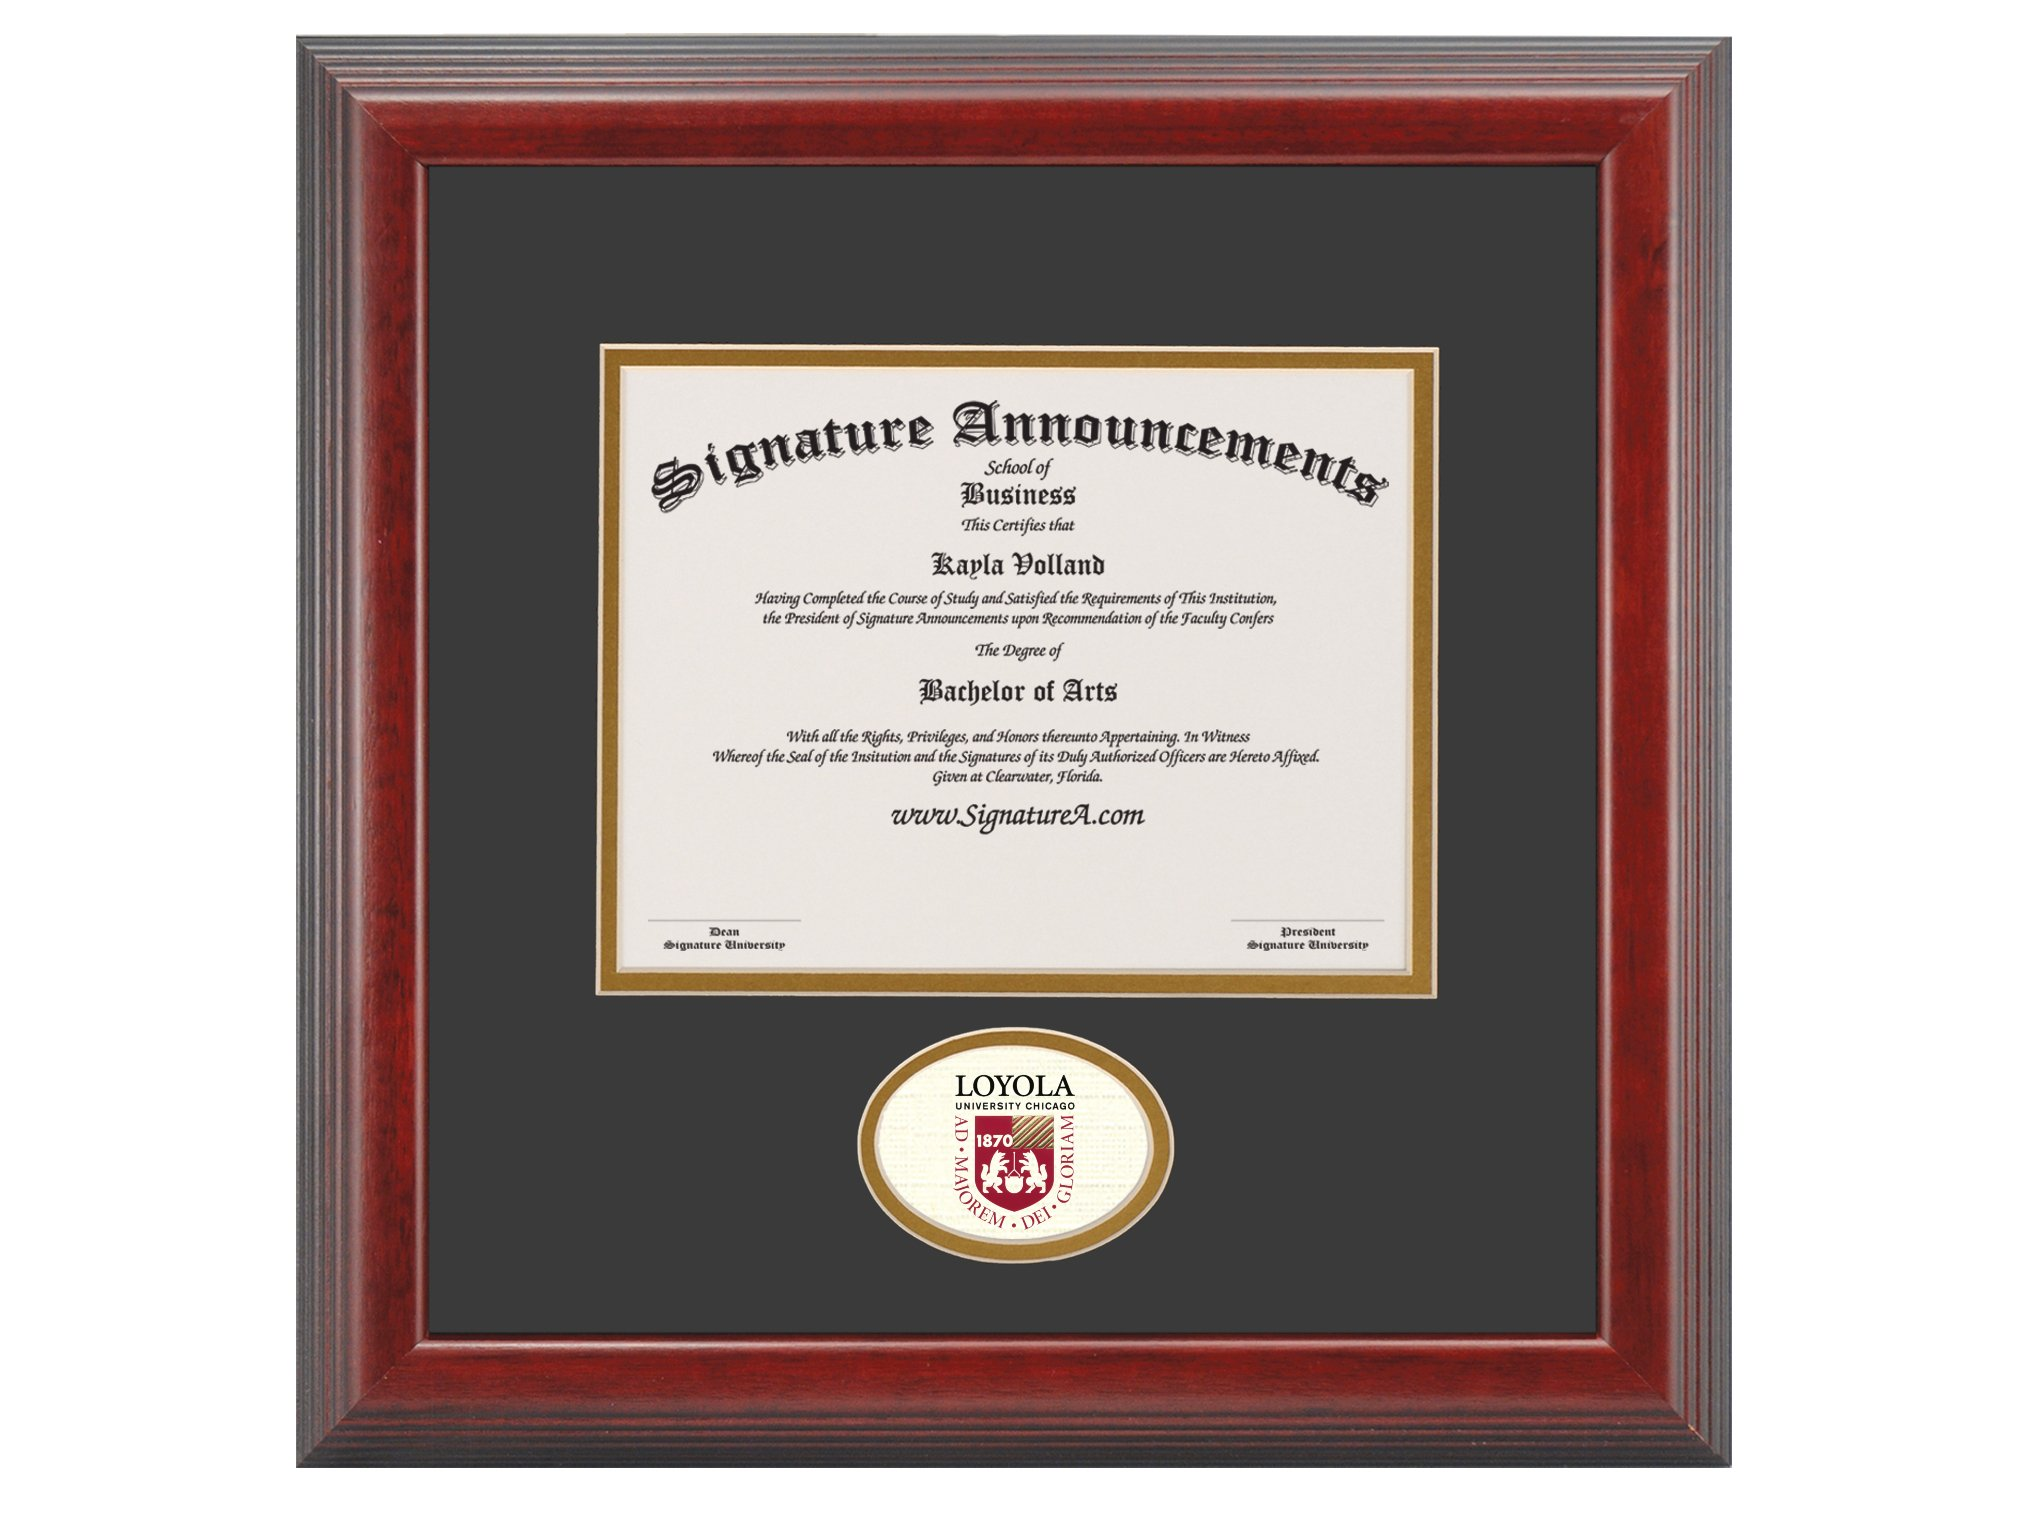 Signature Announcements Loyola-University-Chicago Undergraduate, Graduate/Professional/Doctor Sculpted Foil Seal Diploma Frame, 16'' x 16'', Cherry